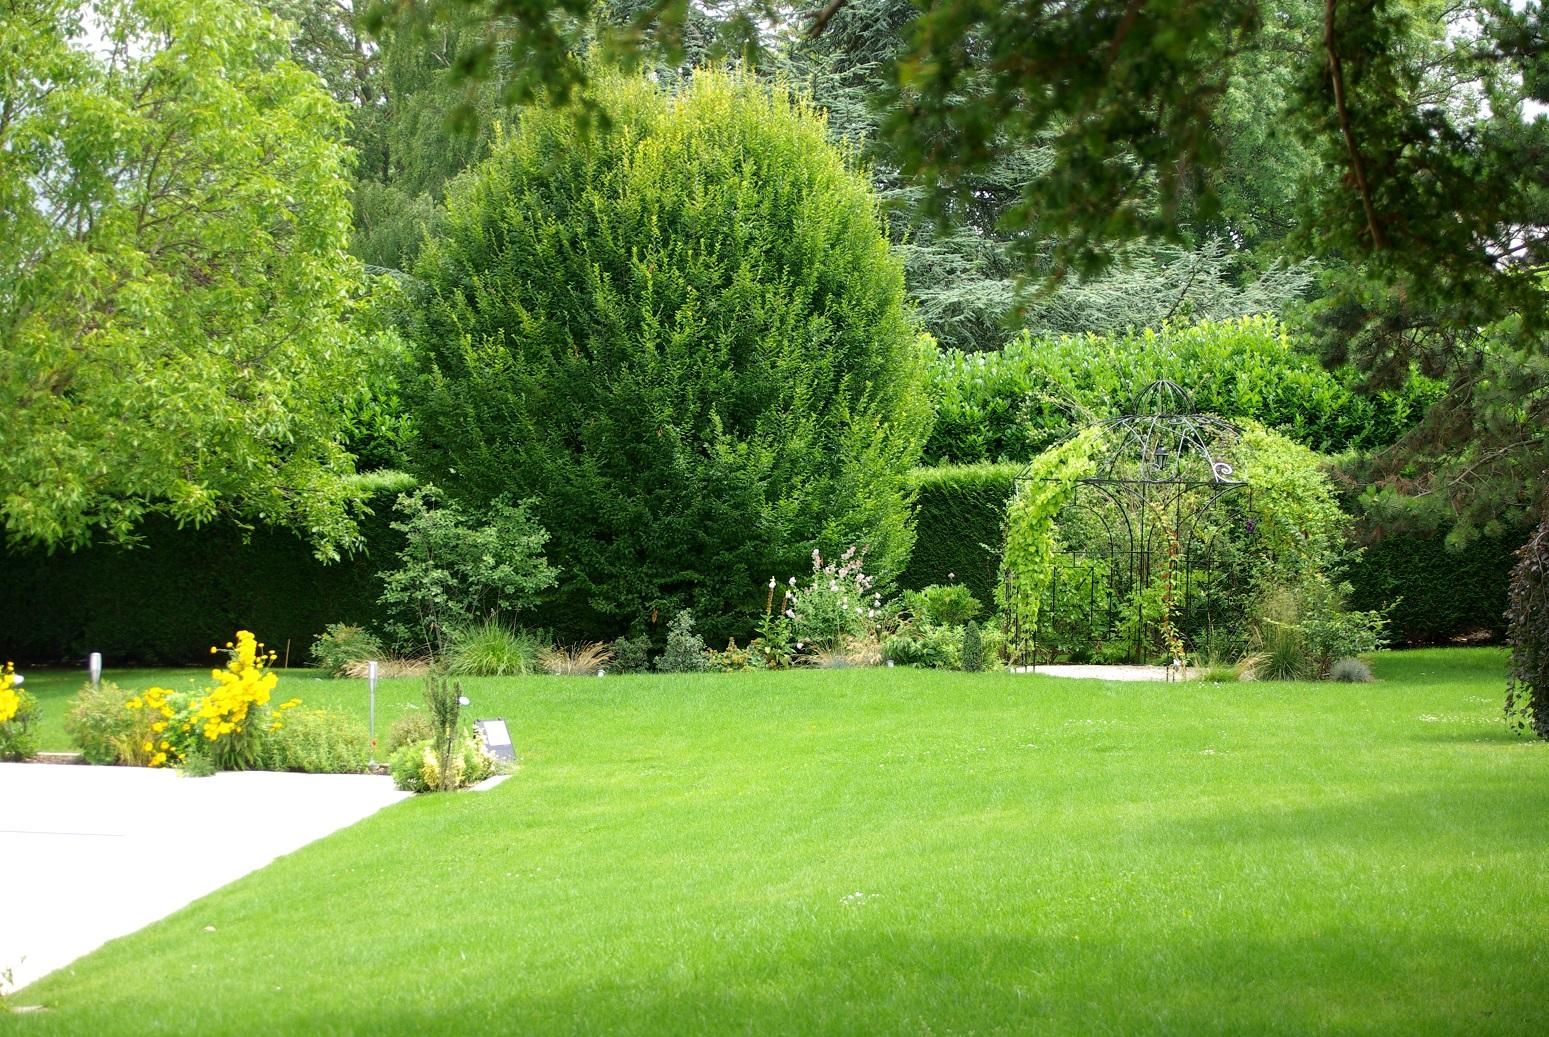 Pergolas abris de jardin fl jardin habille votre jardin for Jardin 2000 epernay